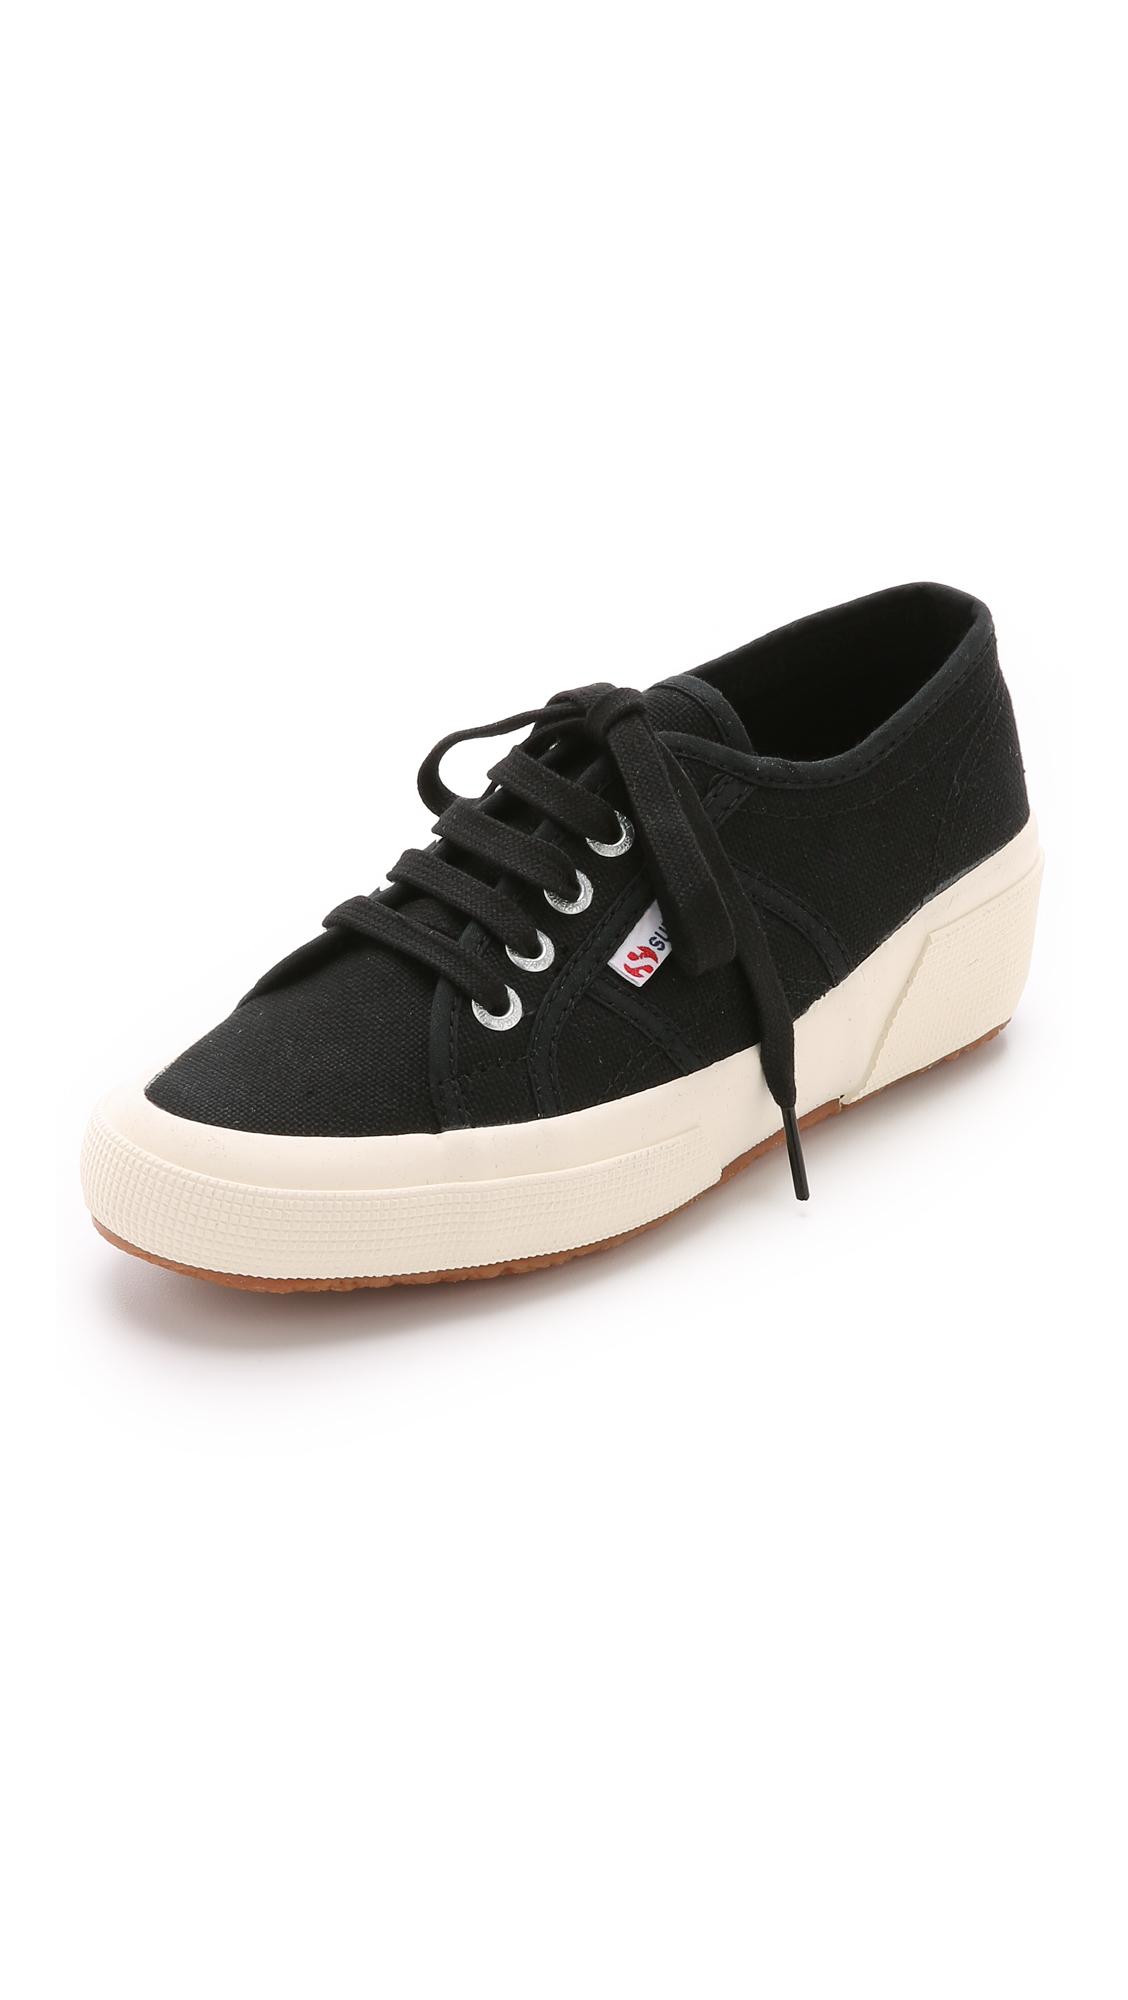 2519c947c1e2 Lyst - Superga 2904 Cotu Wedge Sneakers - White in Black